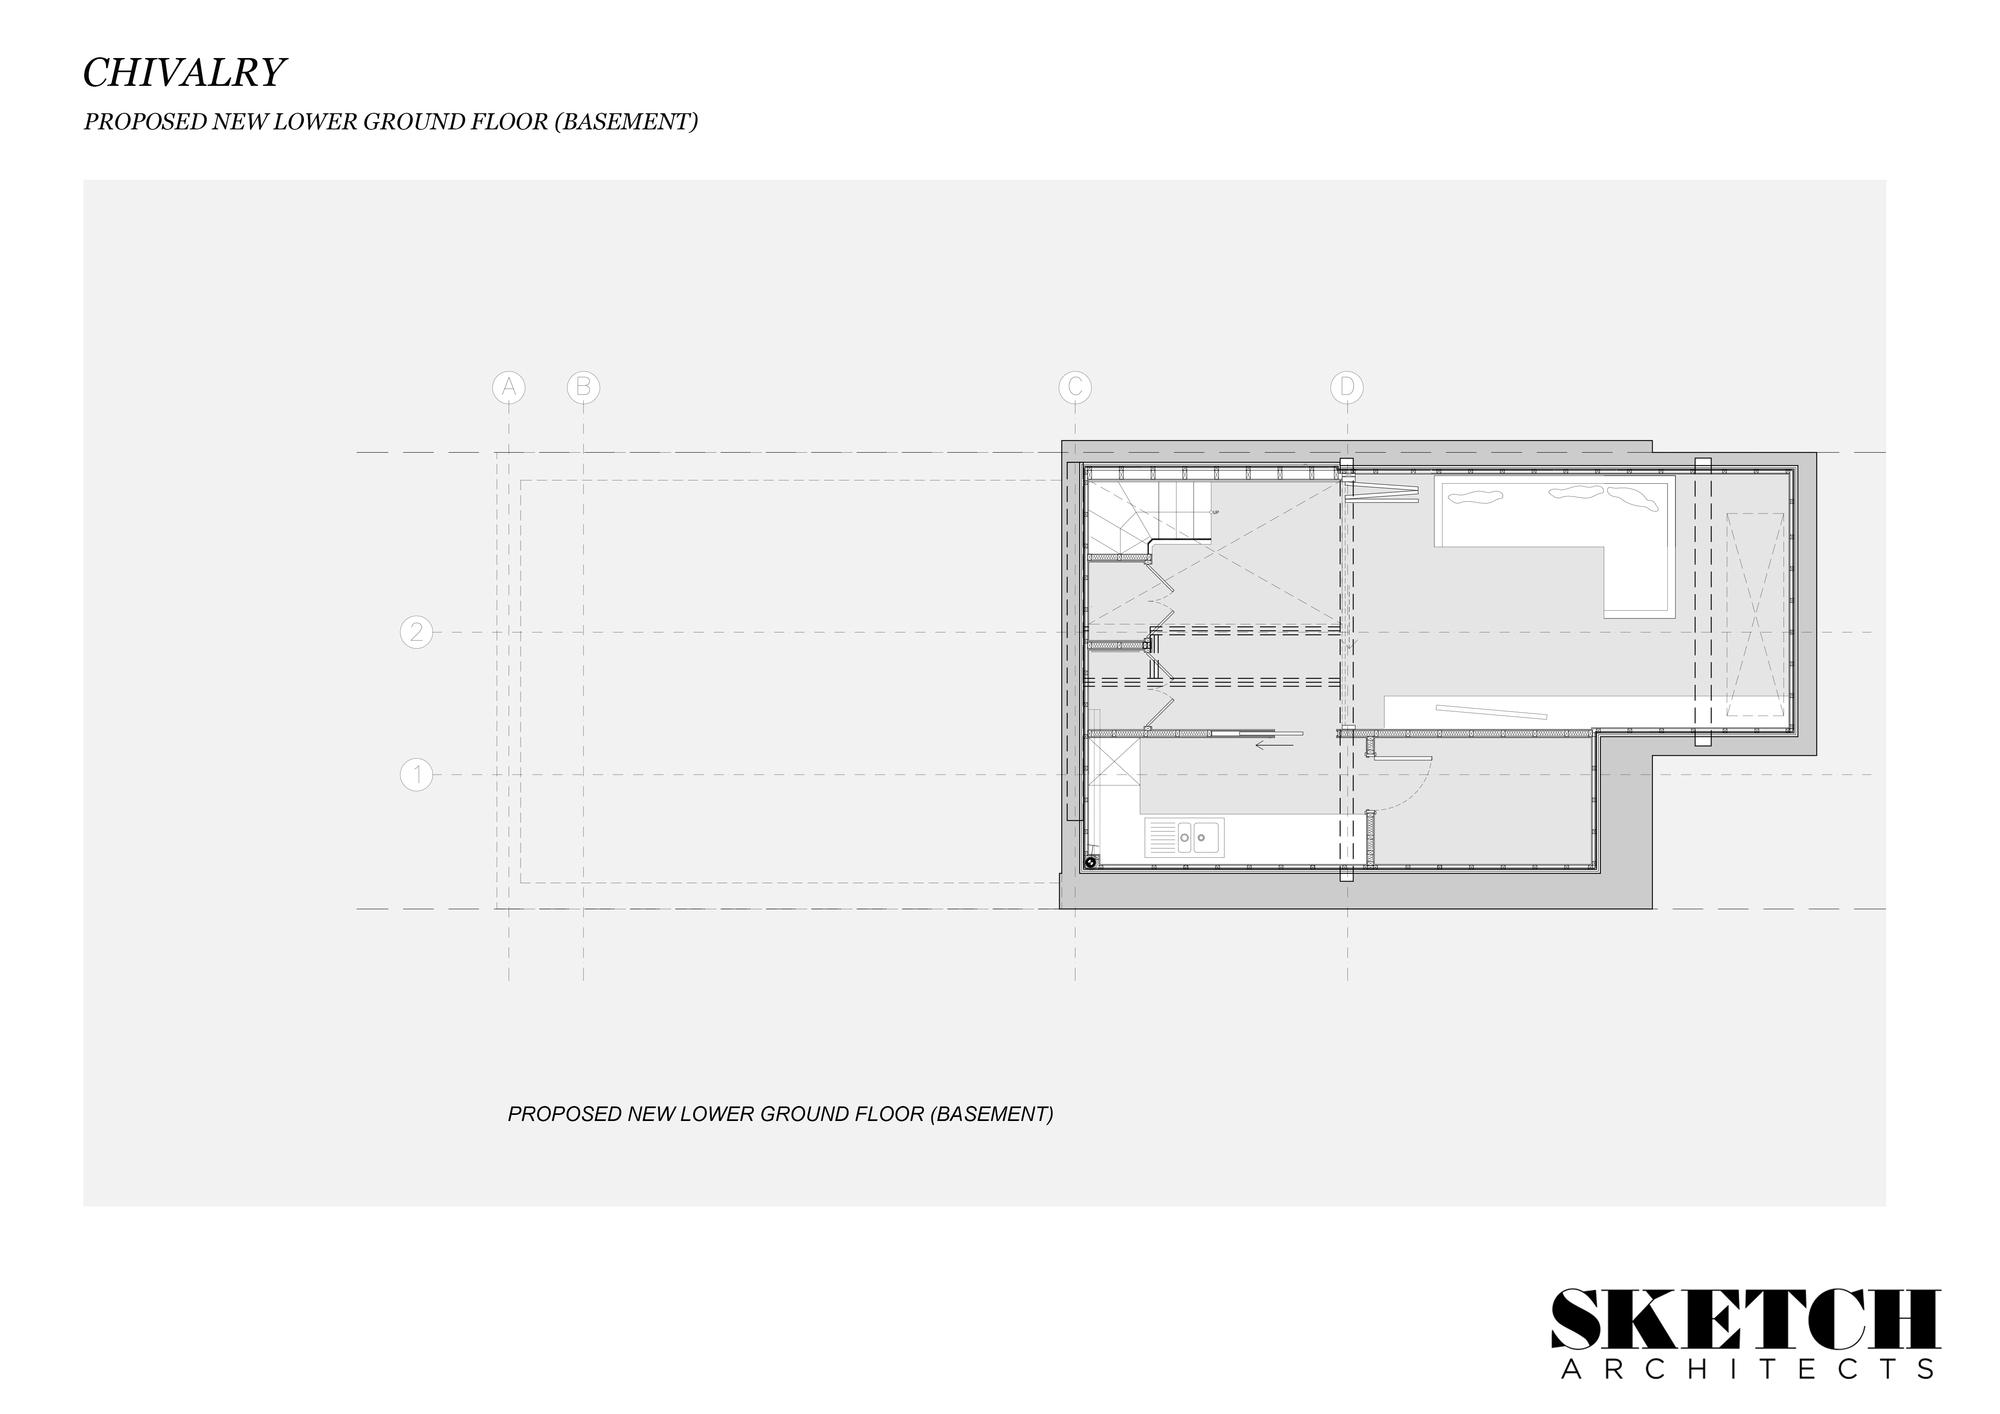 Galeria De Residencia Na Chivalry Road Sketch Architects 17